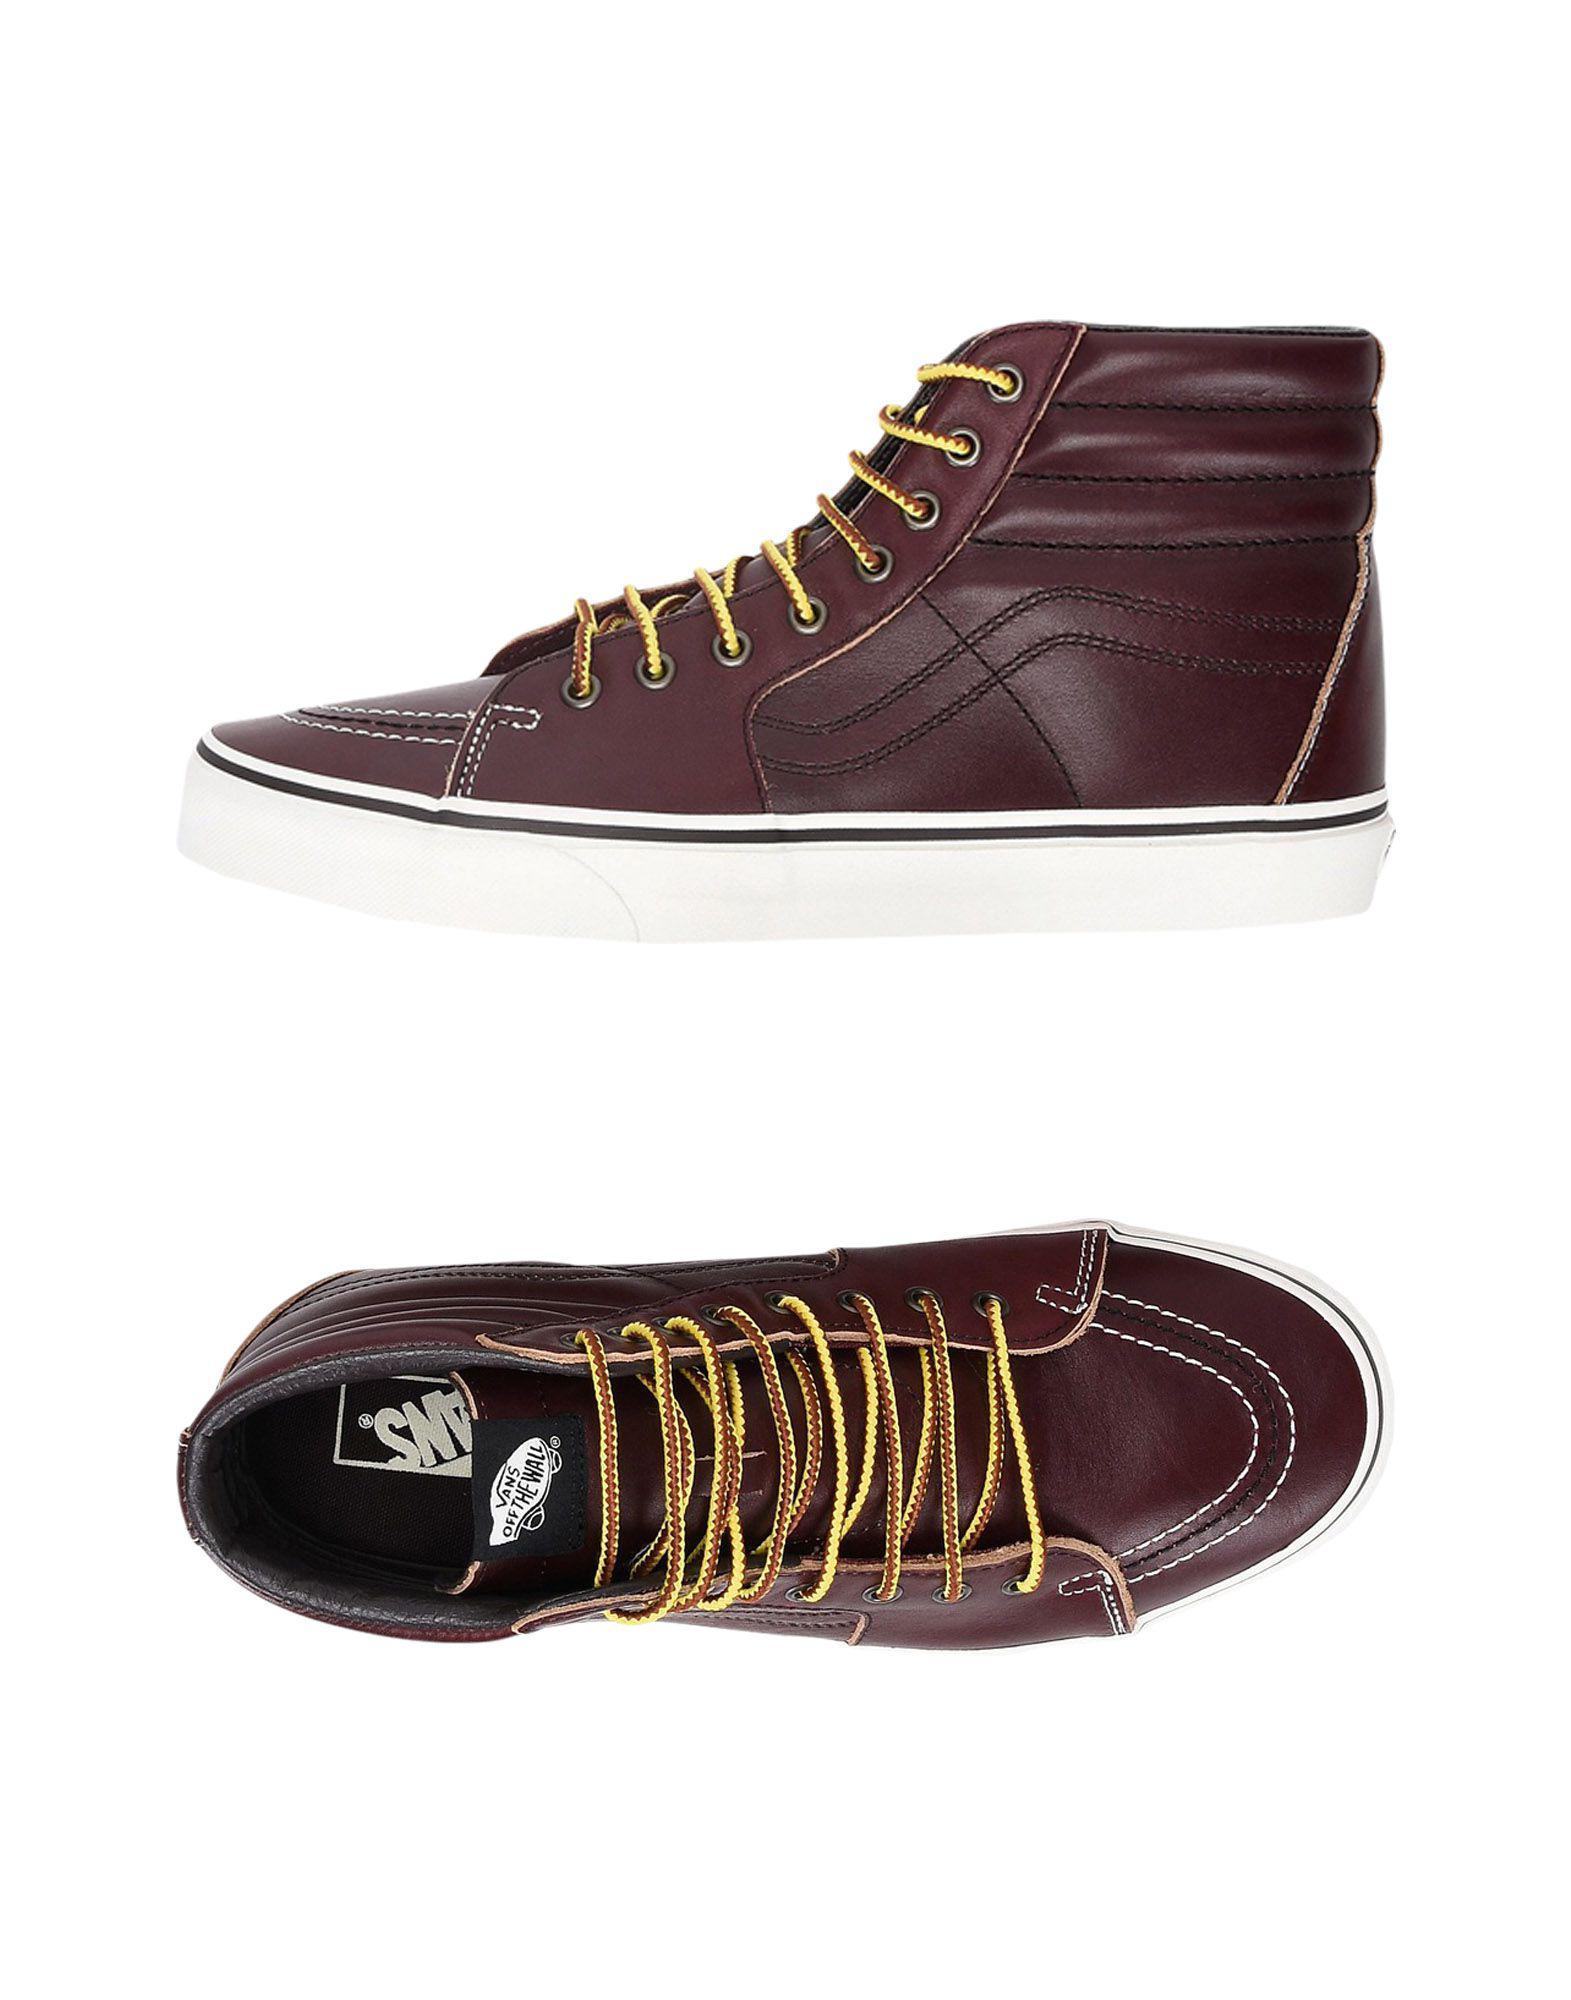 e4cdaef0186 Vans - Brown High-tops   Sneakers for Men - Lyst. View fullscreen